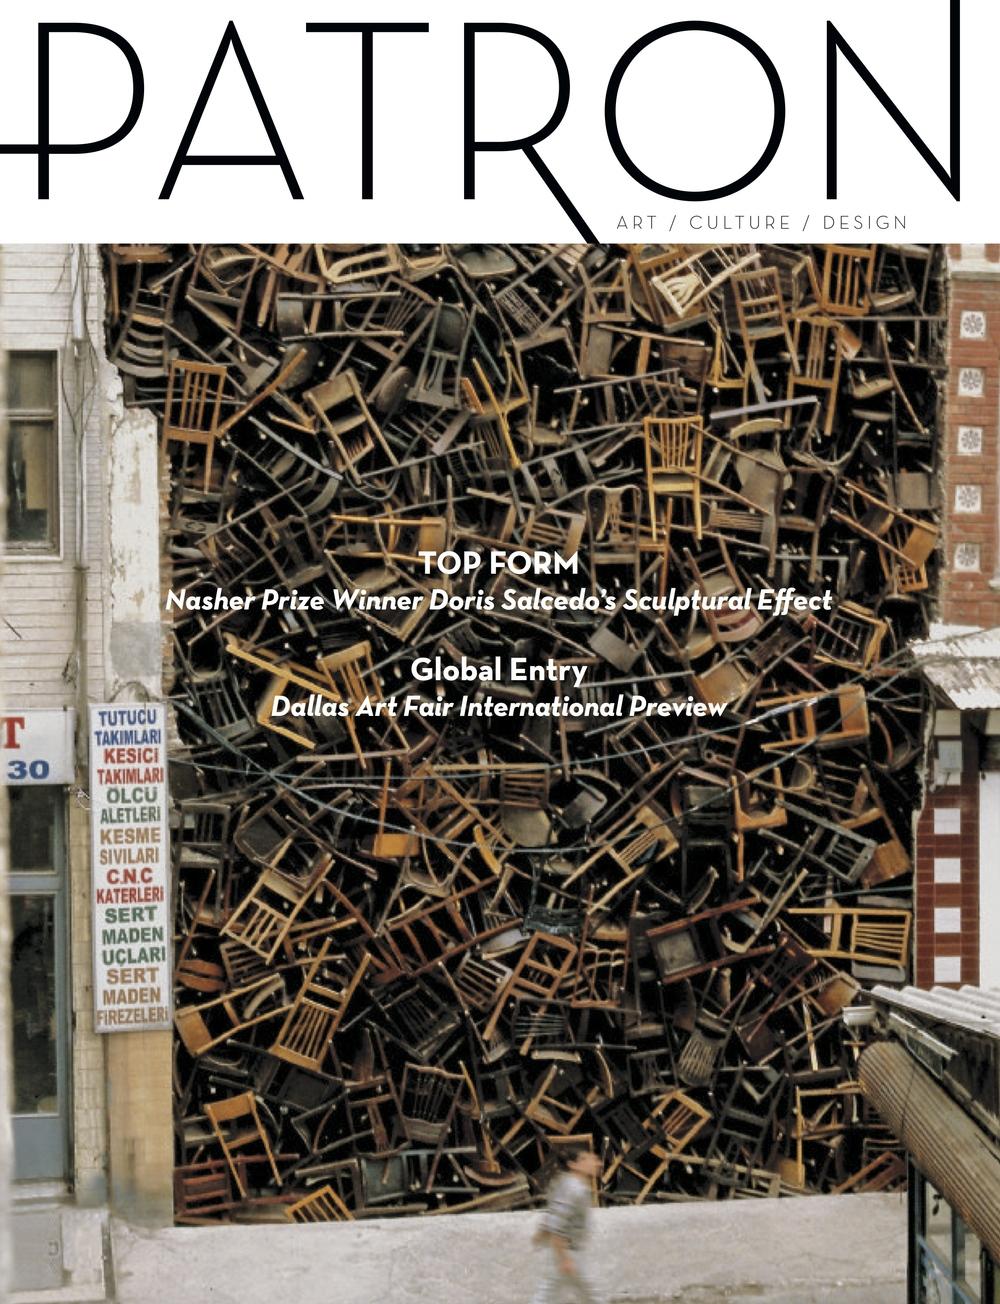 Patron Cover 2016.jpg